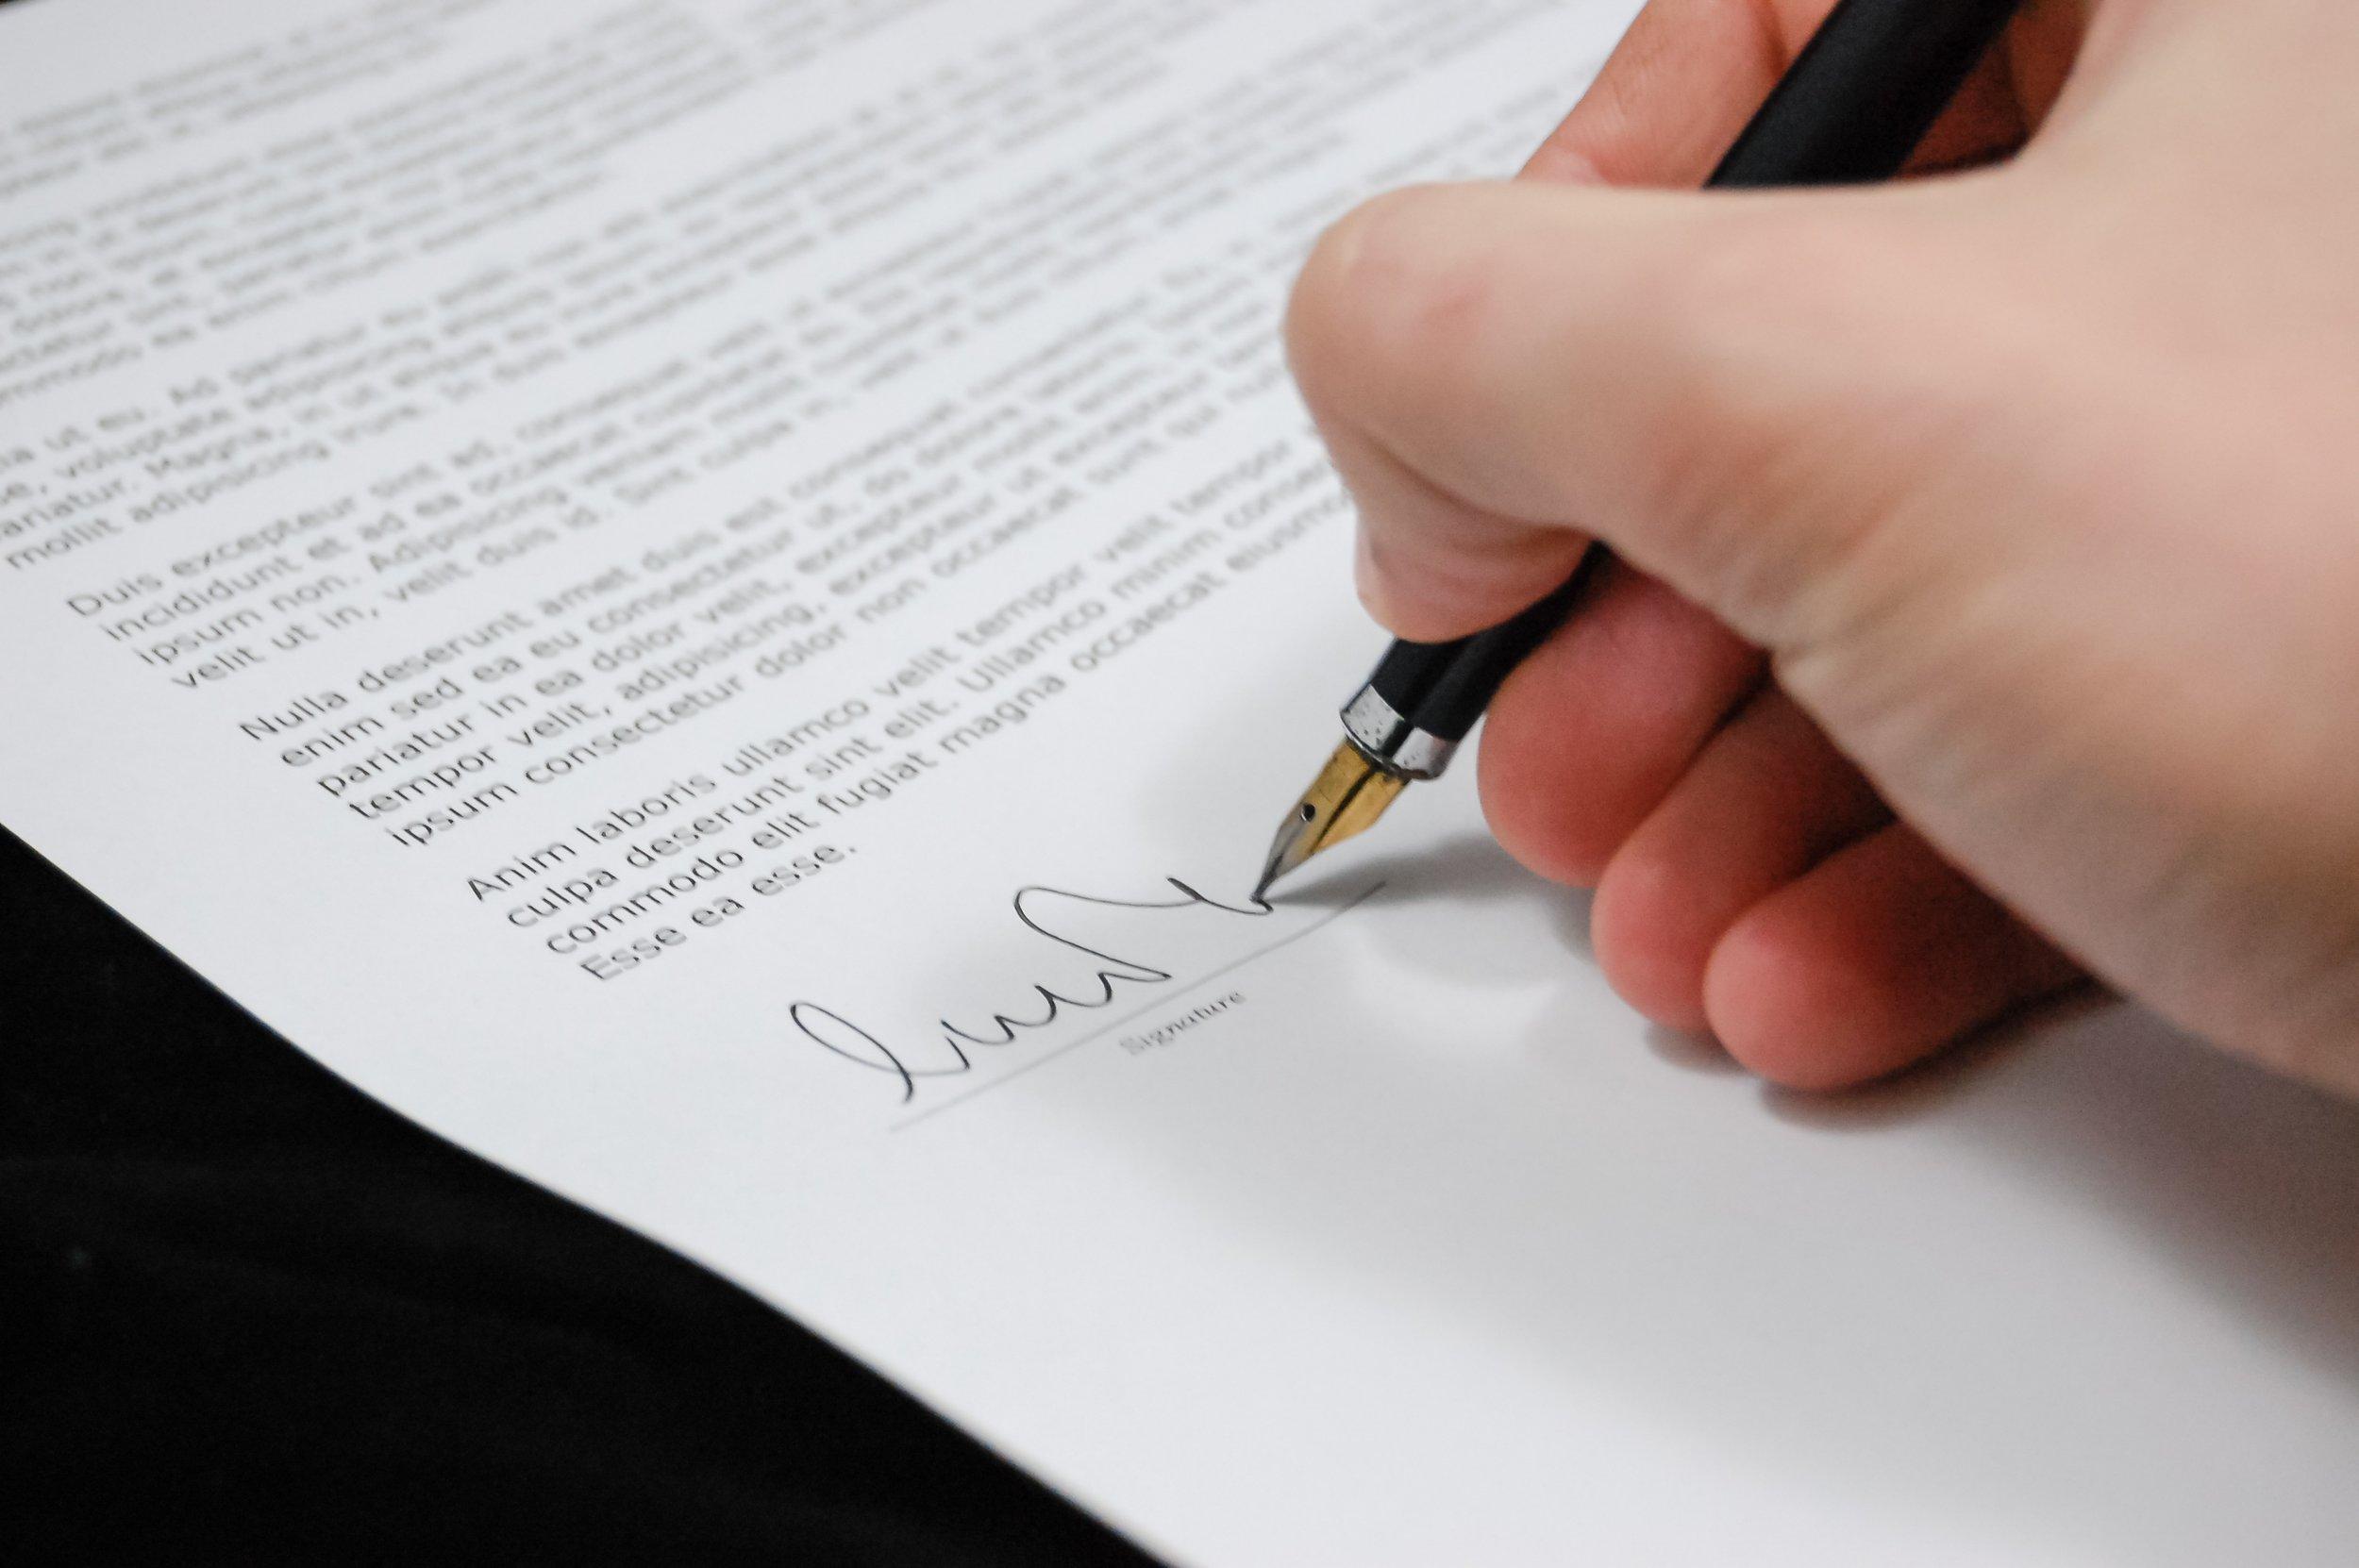 document-agreement-documents-sign-48148.jpeg